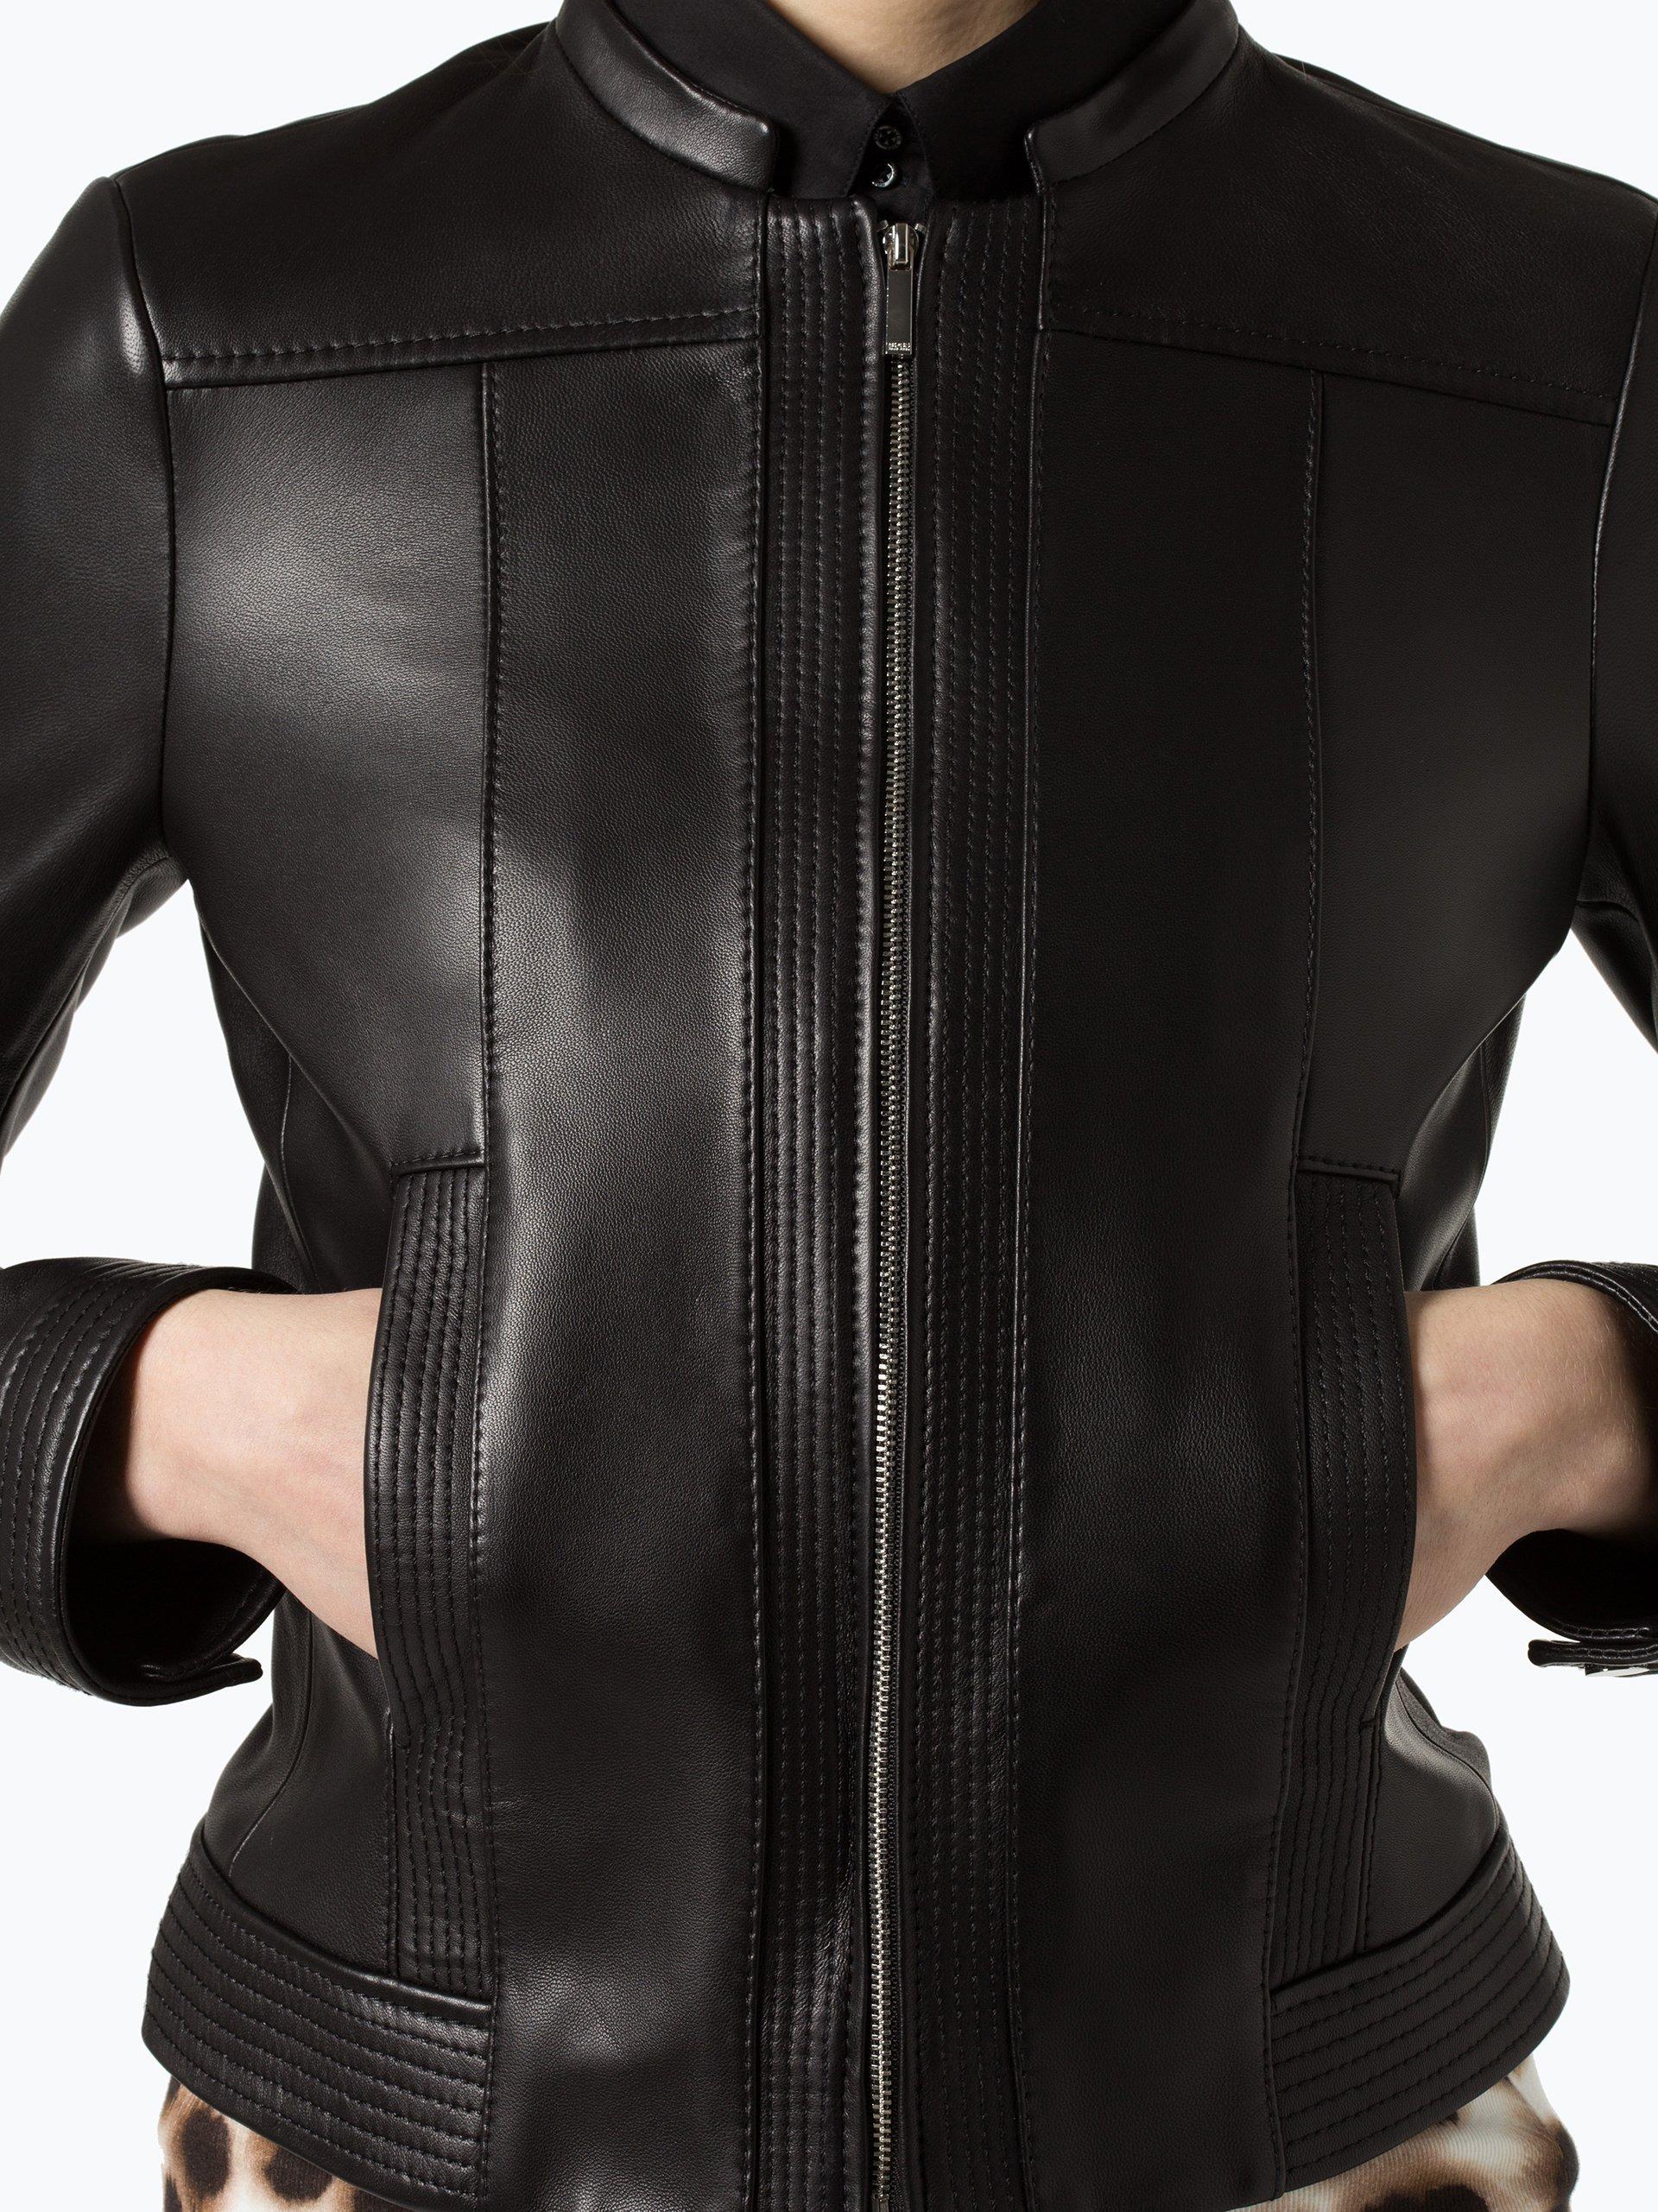 Damen Lederjacke - Safile schwarz BOSS Spielraum Shop-Angebot lkqAs3